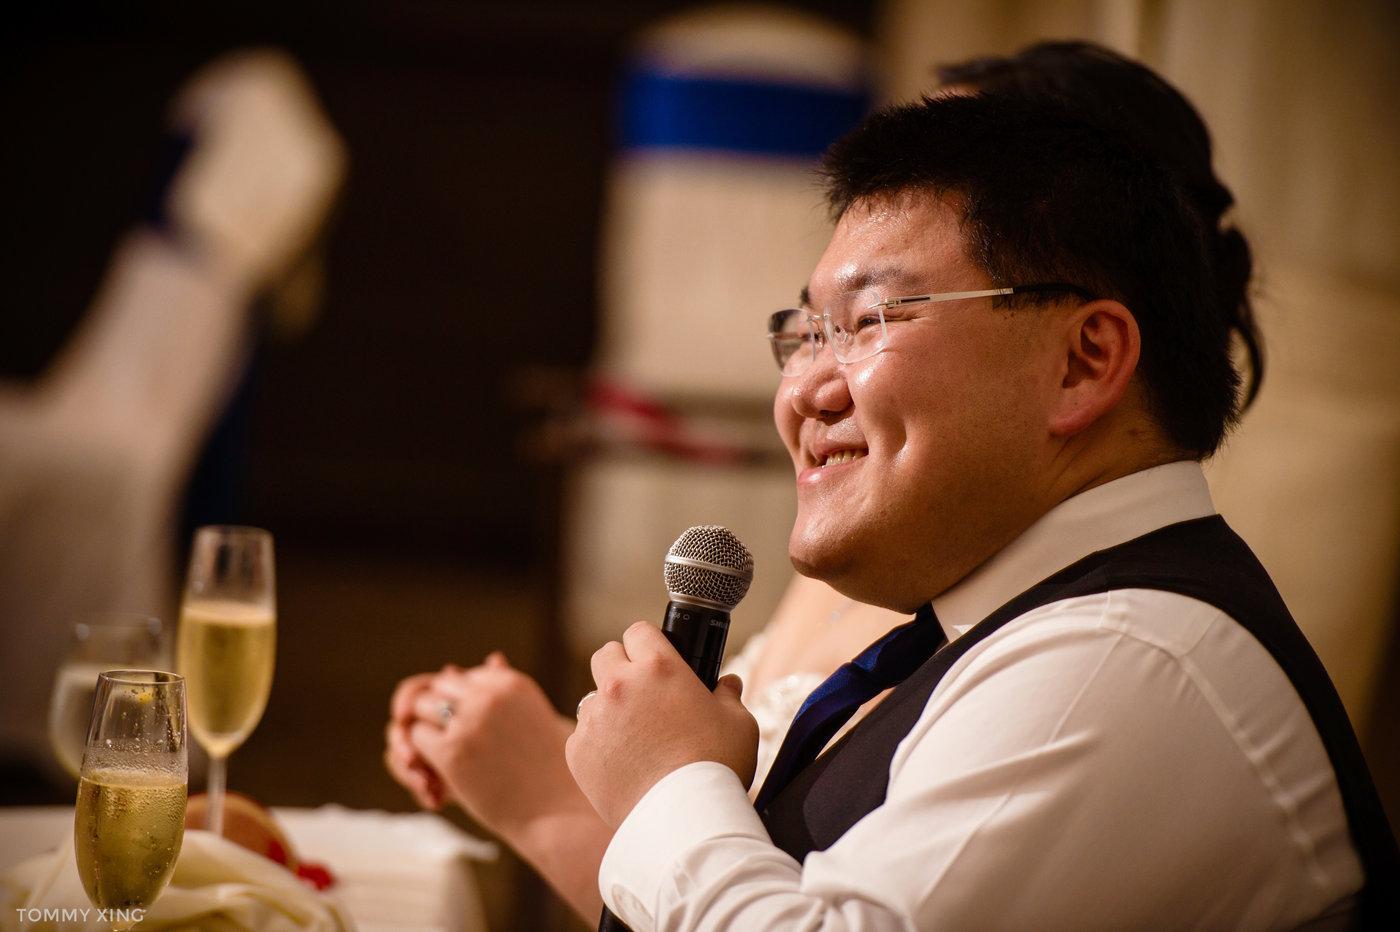 STANFORD MEMORIAL CHURCH WEDDING - Wenjie & Chengcheng - SAN FRANCISCO BAY AREA 斯坦福教堂婚礼跟拍 - 洛杉矶婚礼婚纱照摄影师 Tommy Xing Photography208.jpg